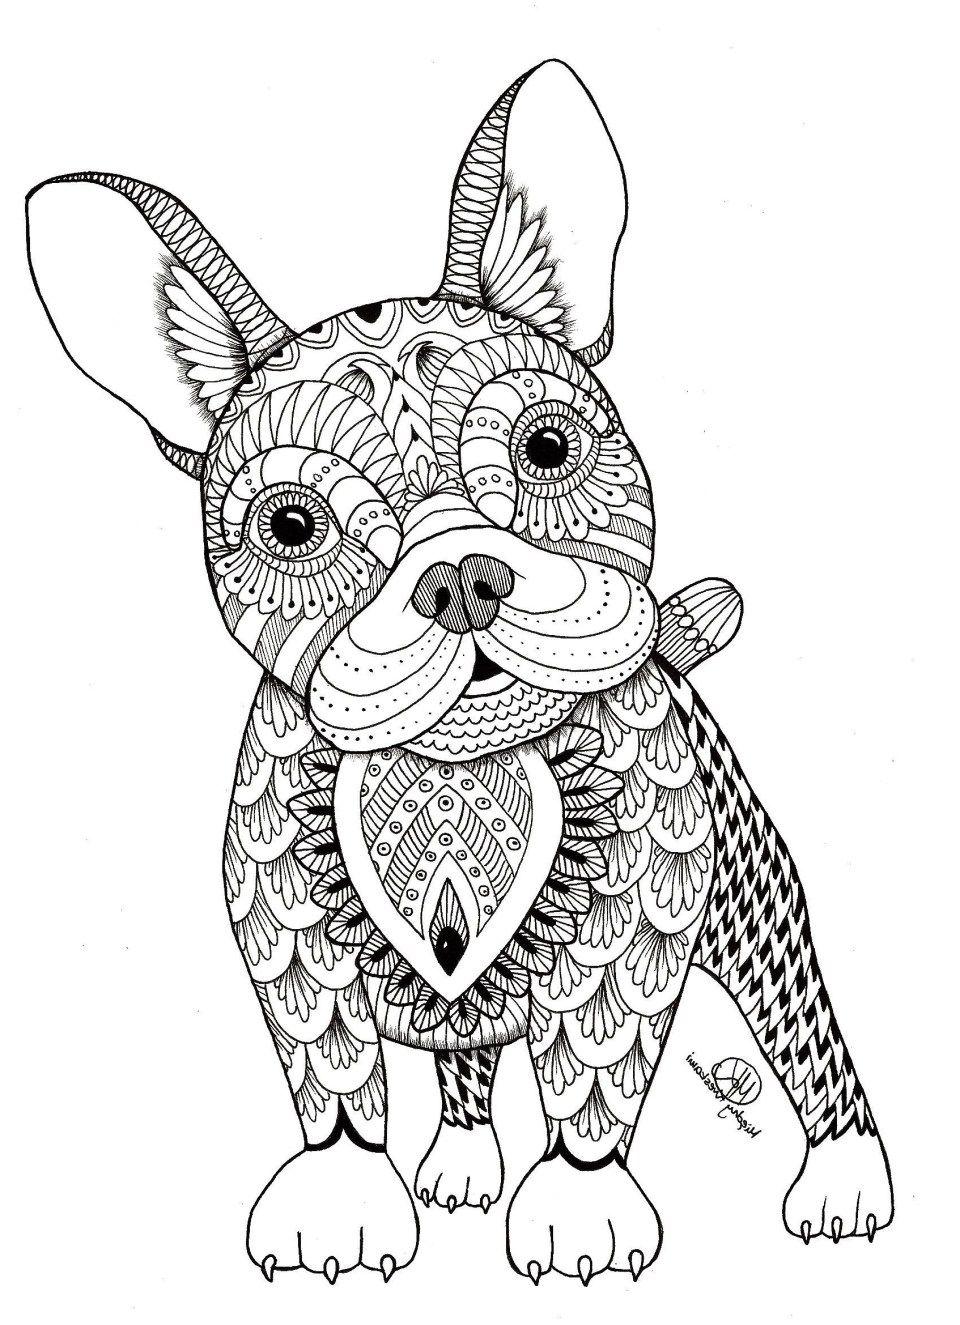 25 Inspiration Image Of Animal Mandala Coloring Pages Entitlementtrap Com Mandala Coloring Books Mandala Coloring Animal Coloring Books [ 1325 x 960 Pixel ]